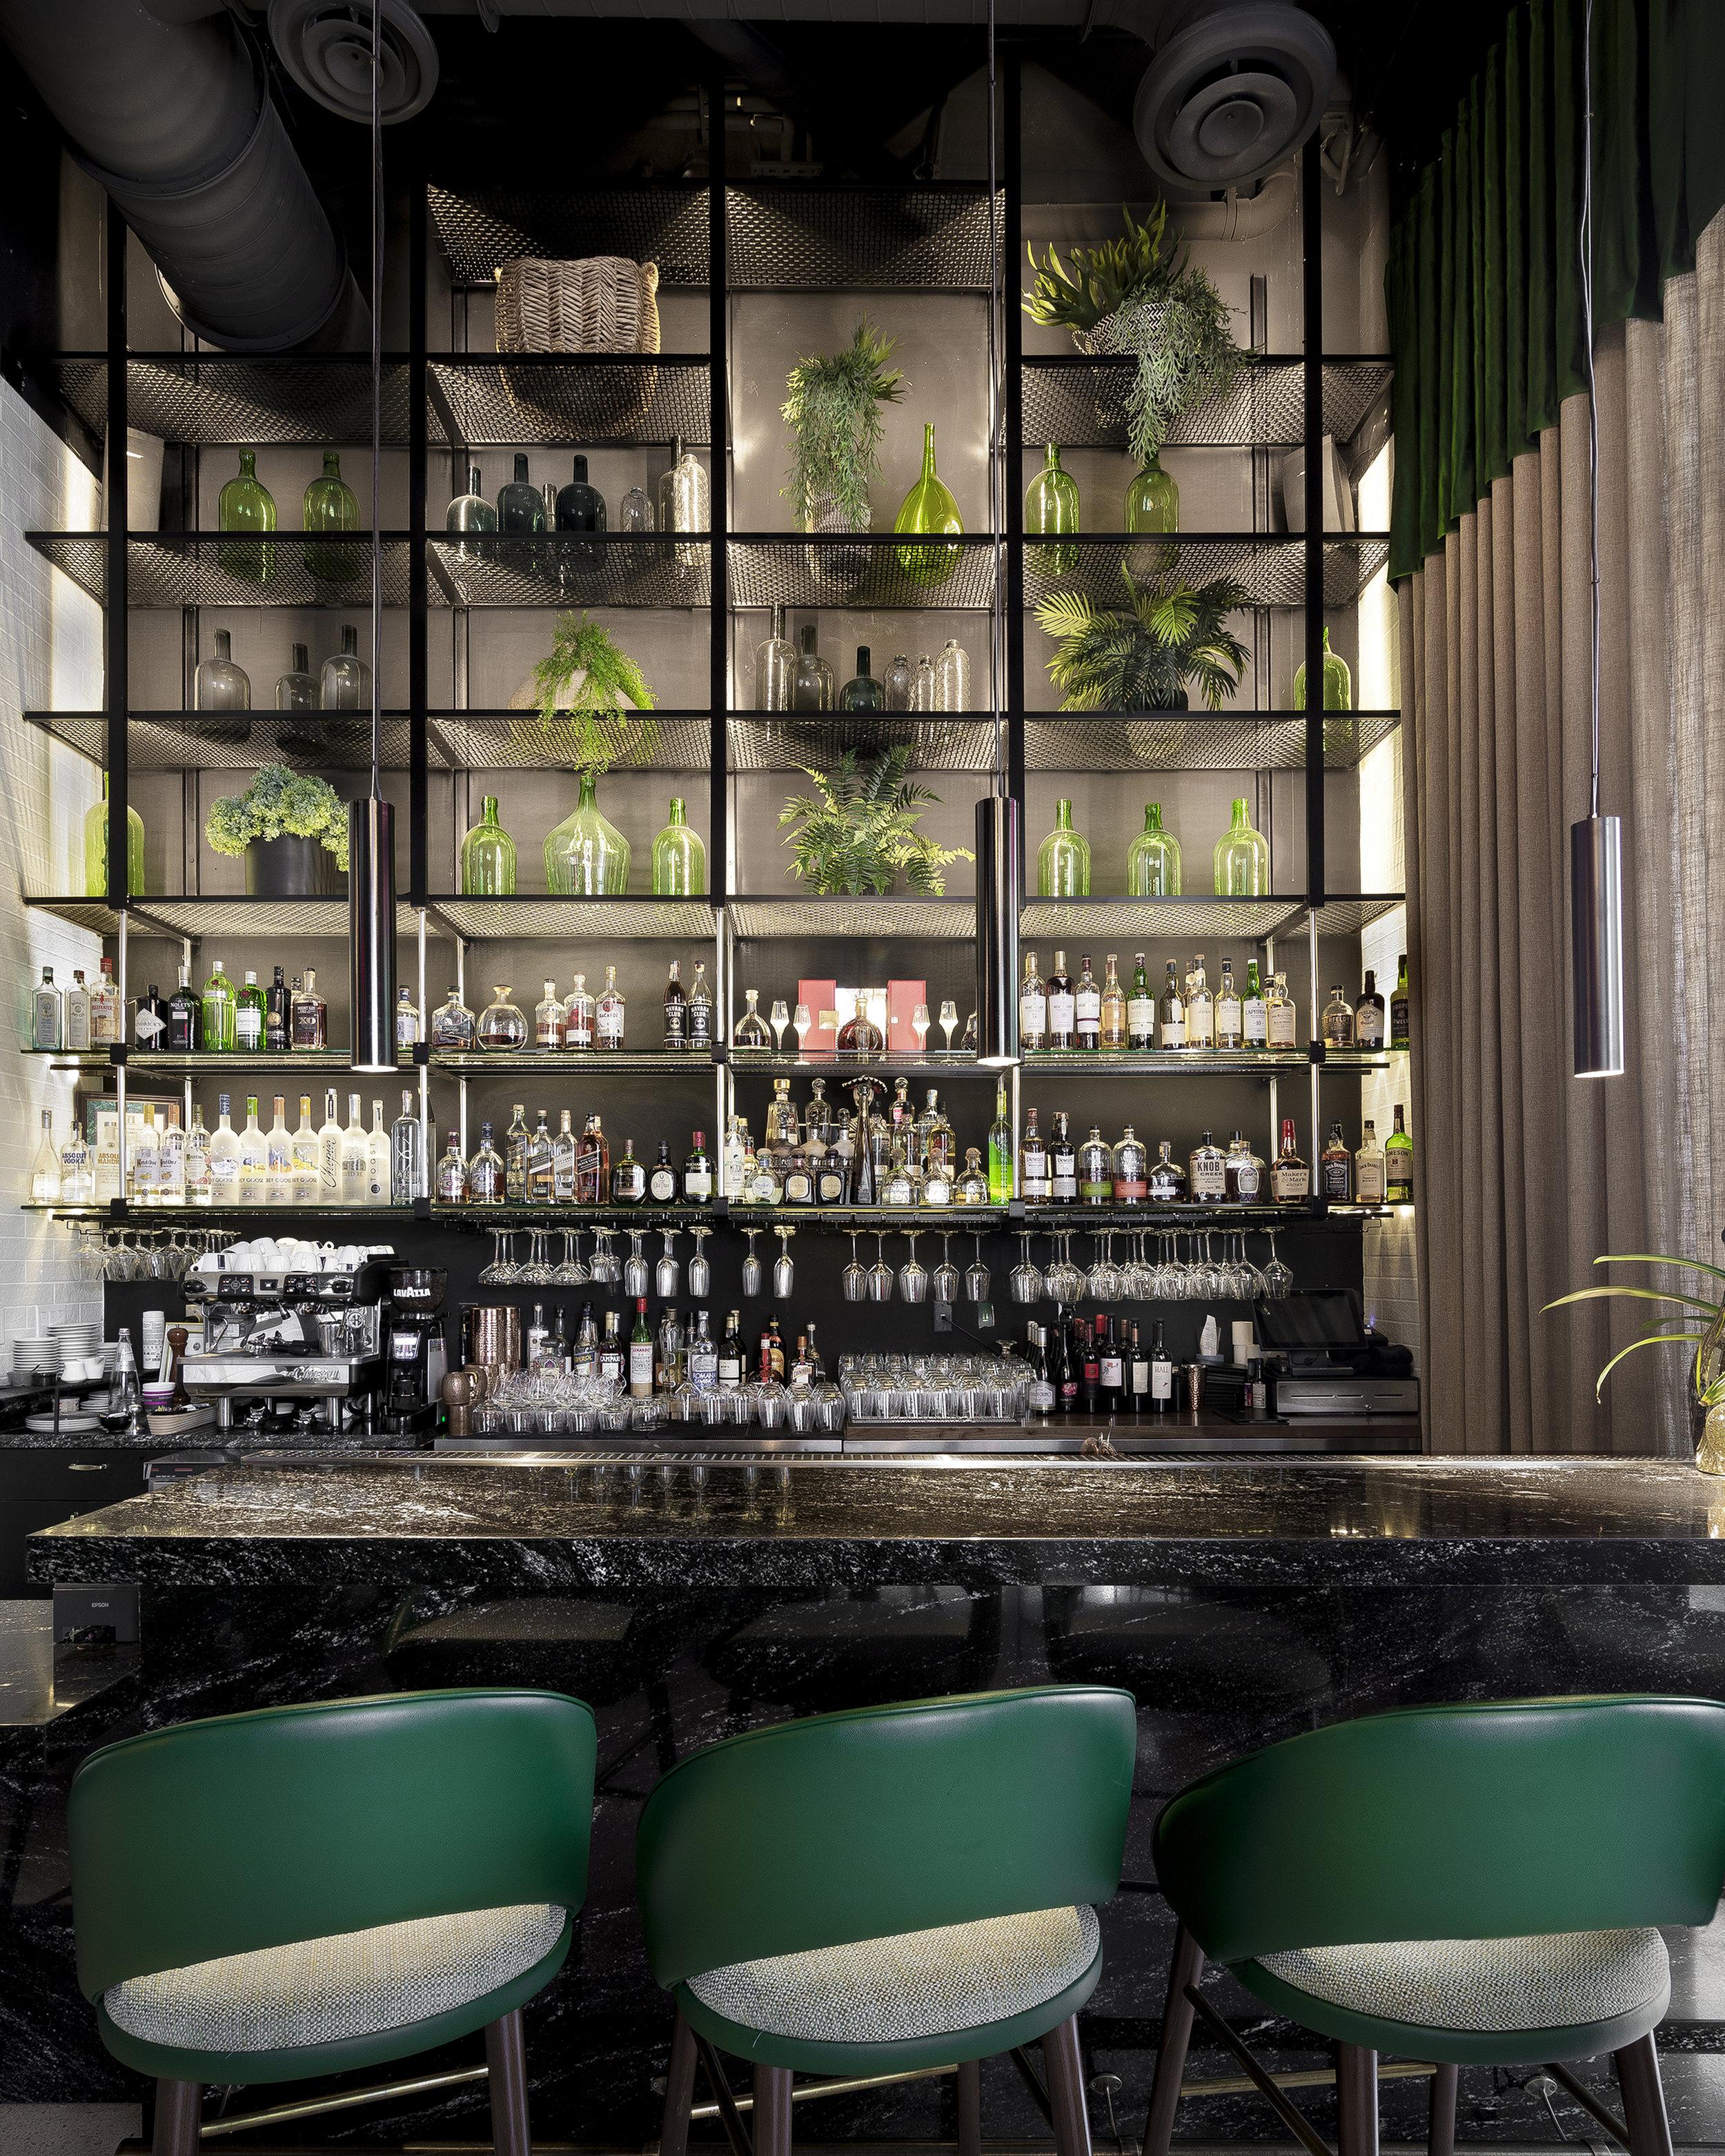 m-house-restaurant-interior-bar.jpg